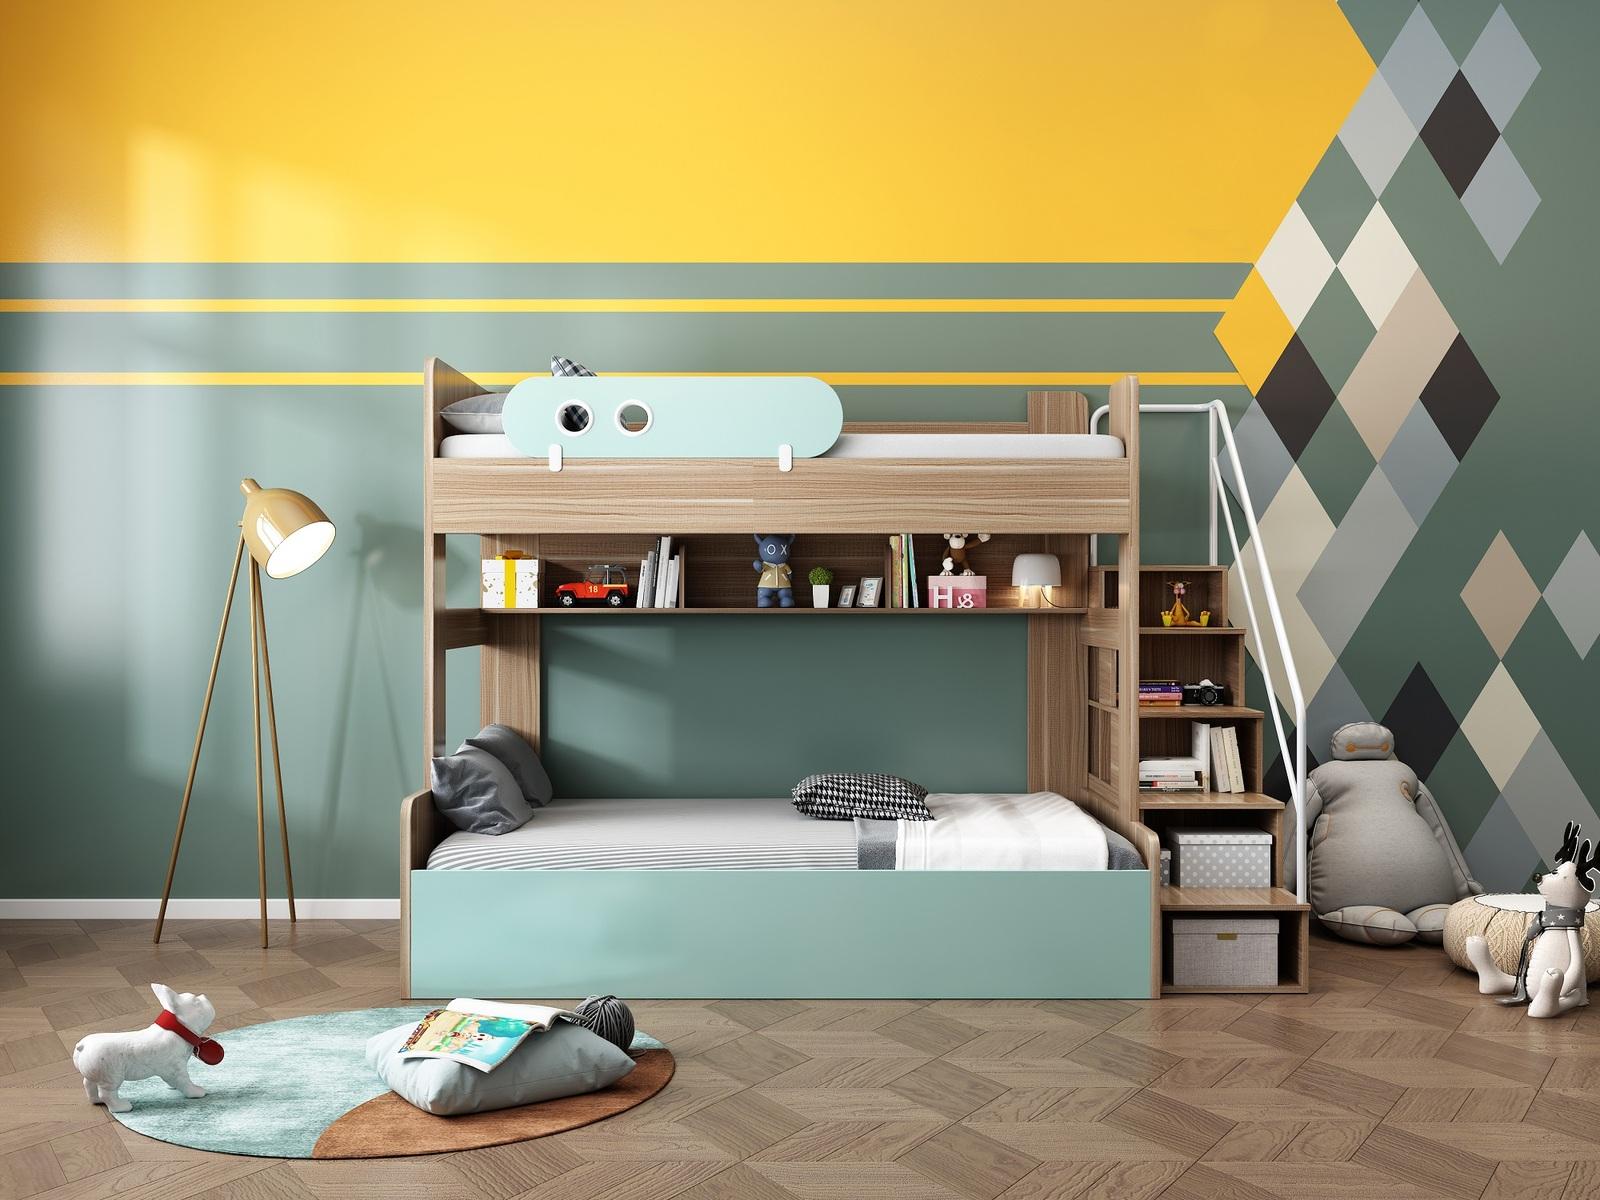 best-boy-bedroom-decorating-ideas.jpg